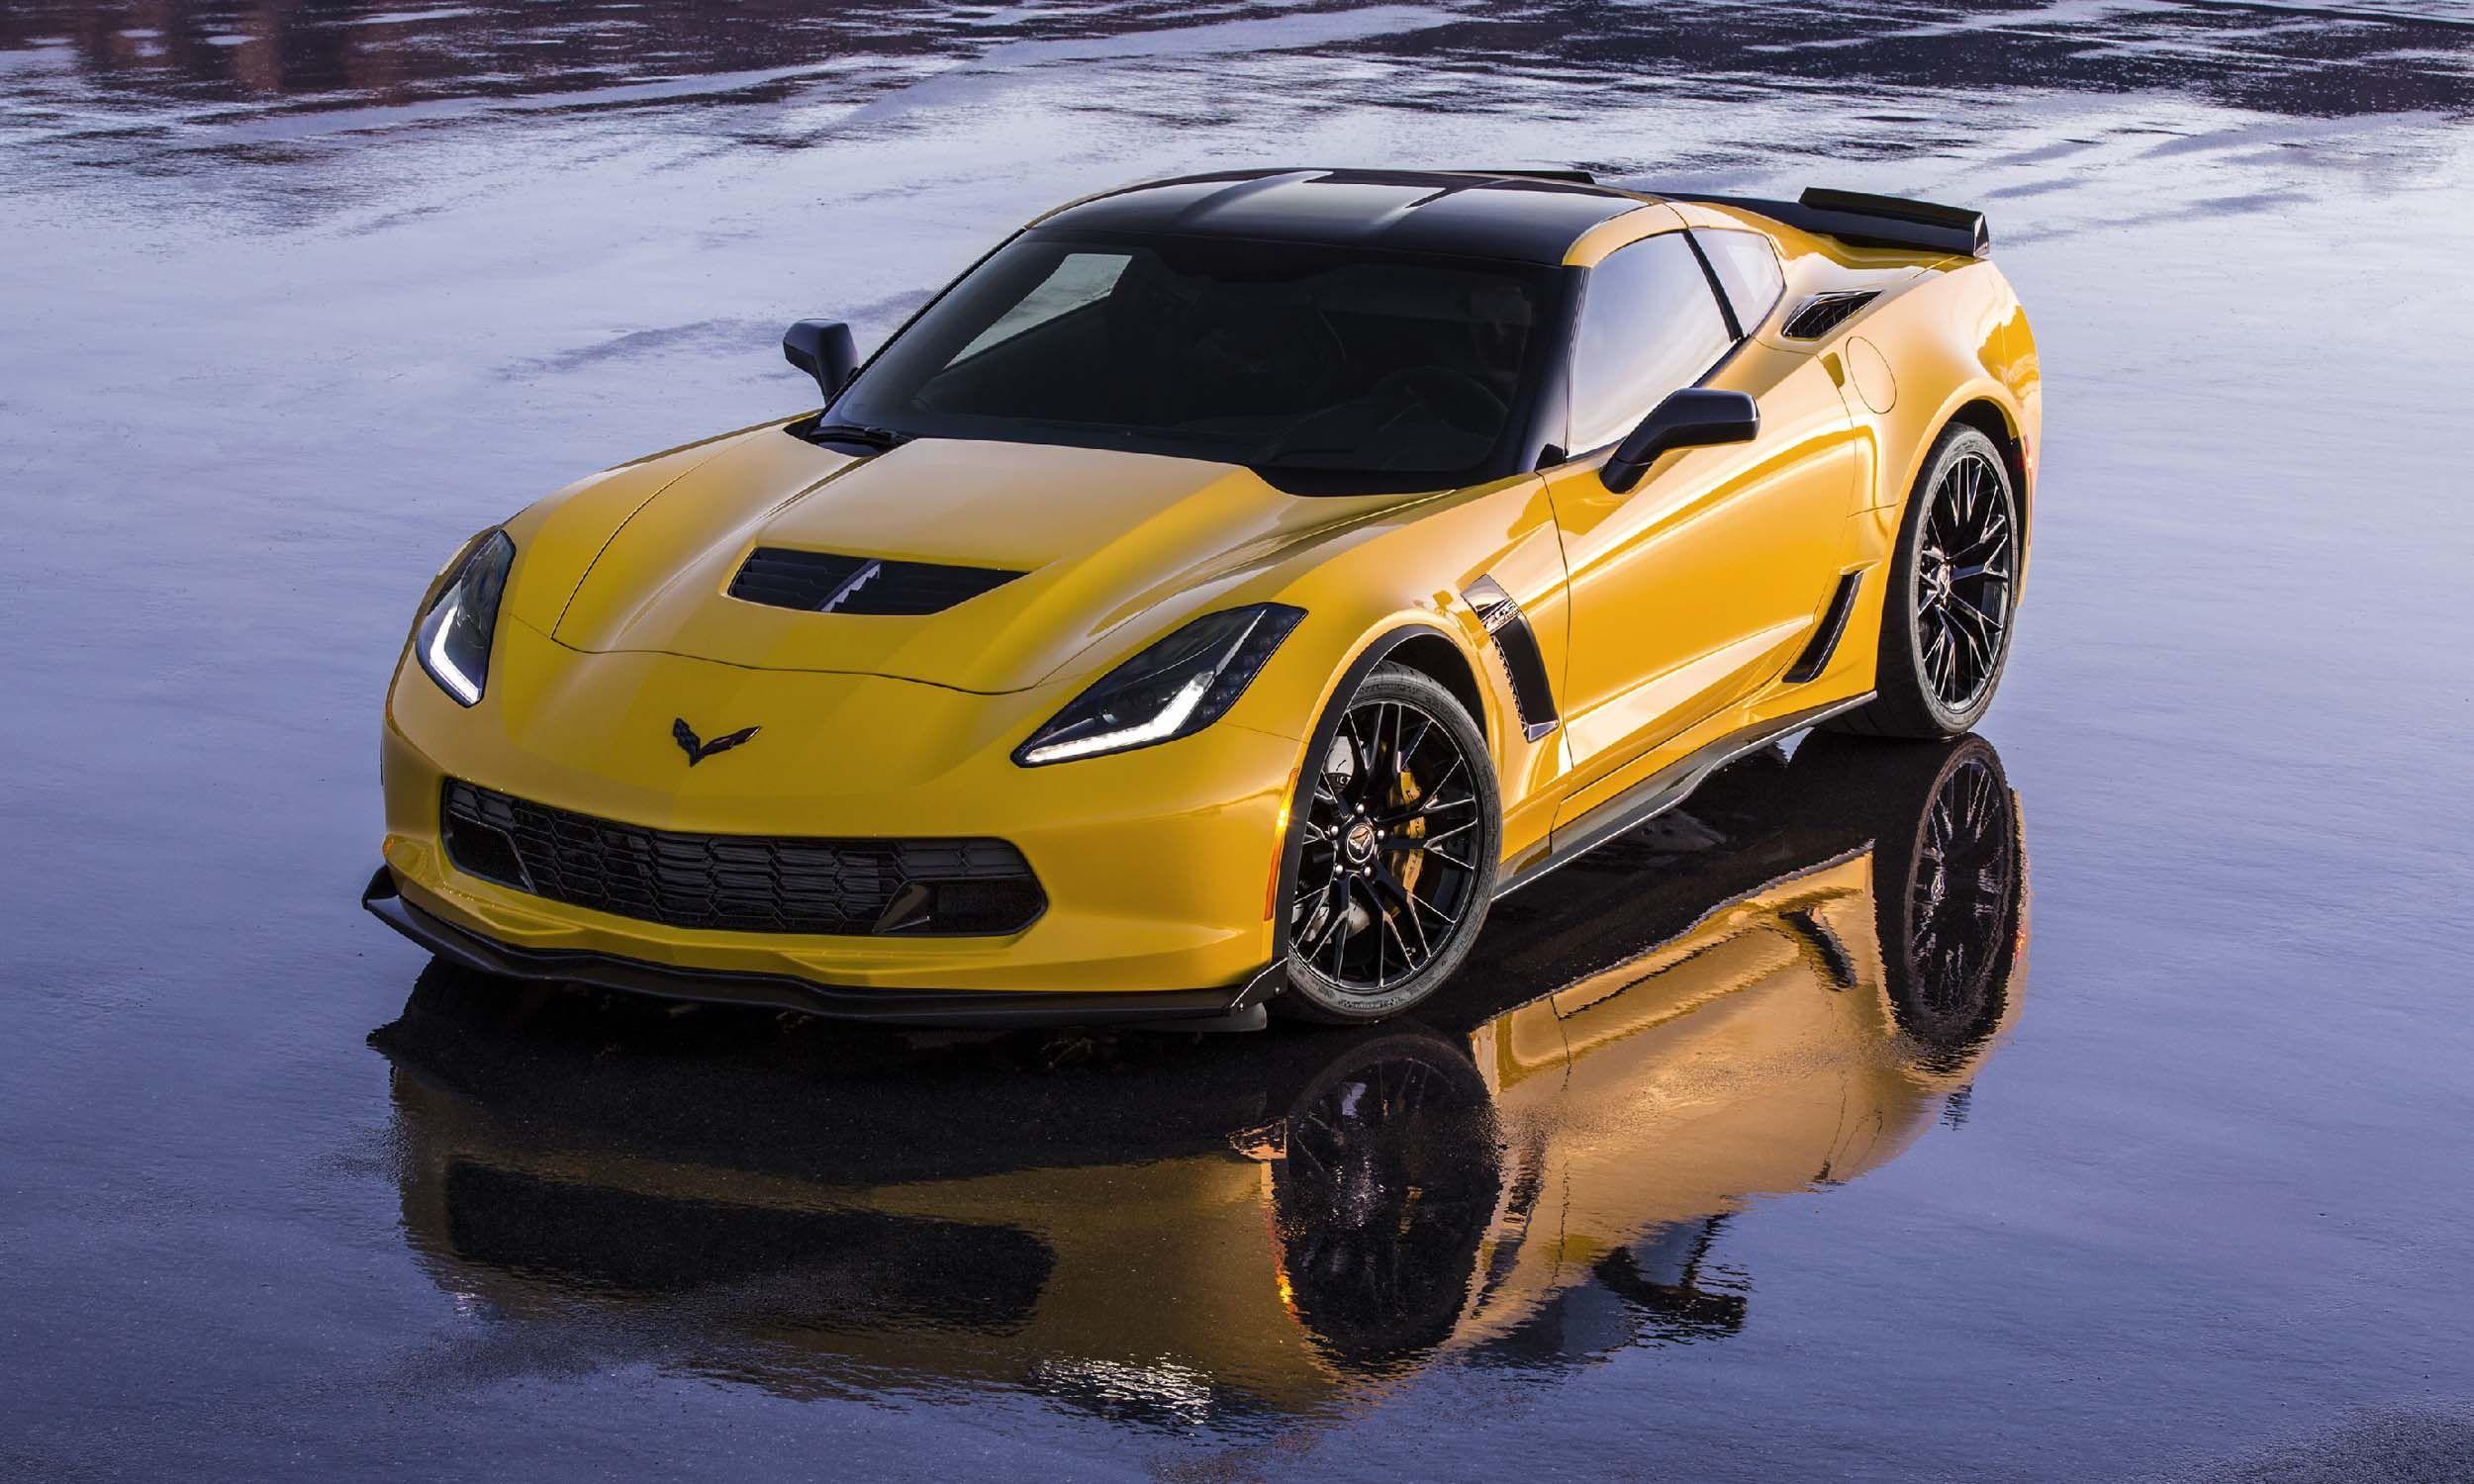 Chevrolet Corvette Z06<br>Price: $78,000<br>We have seen some ...